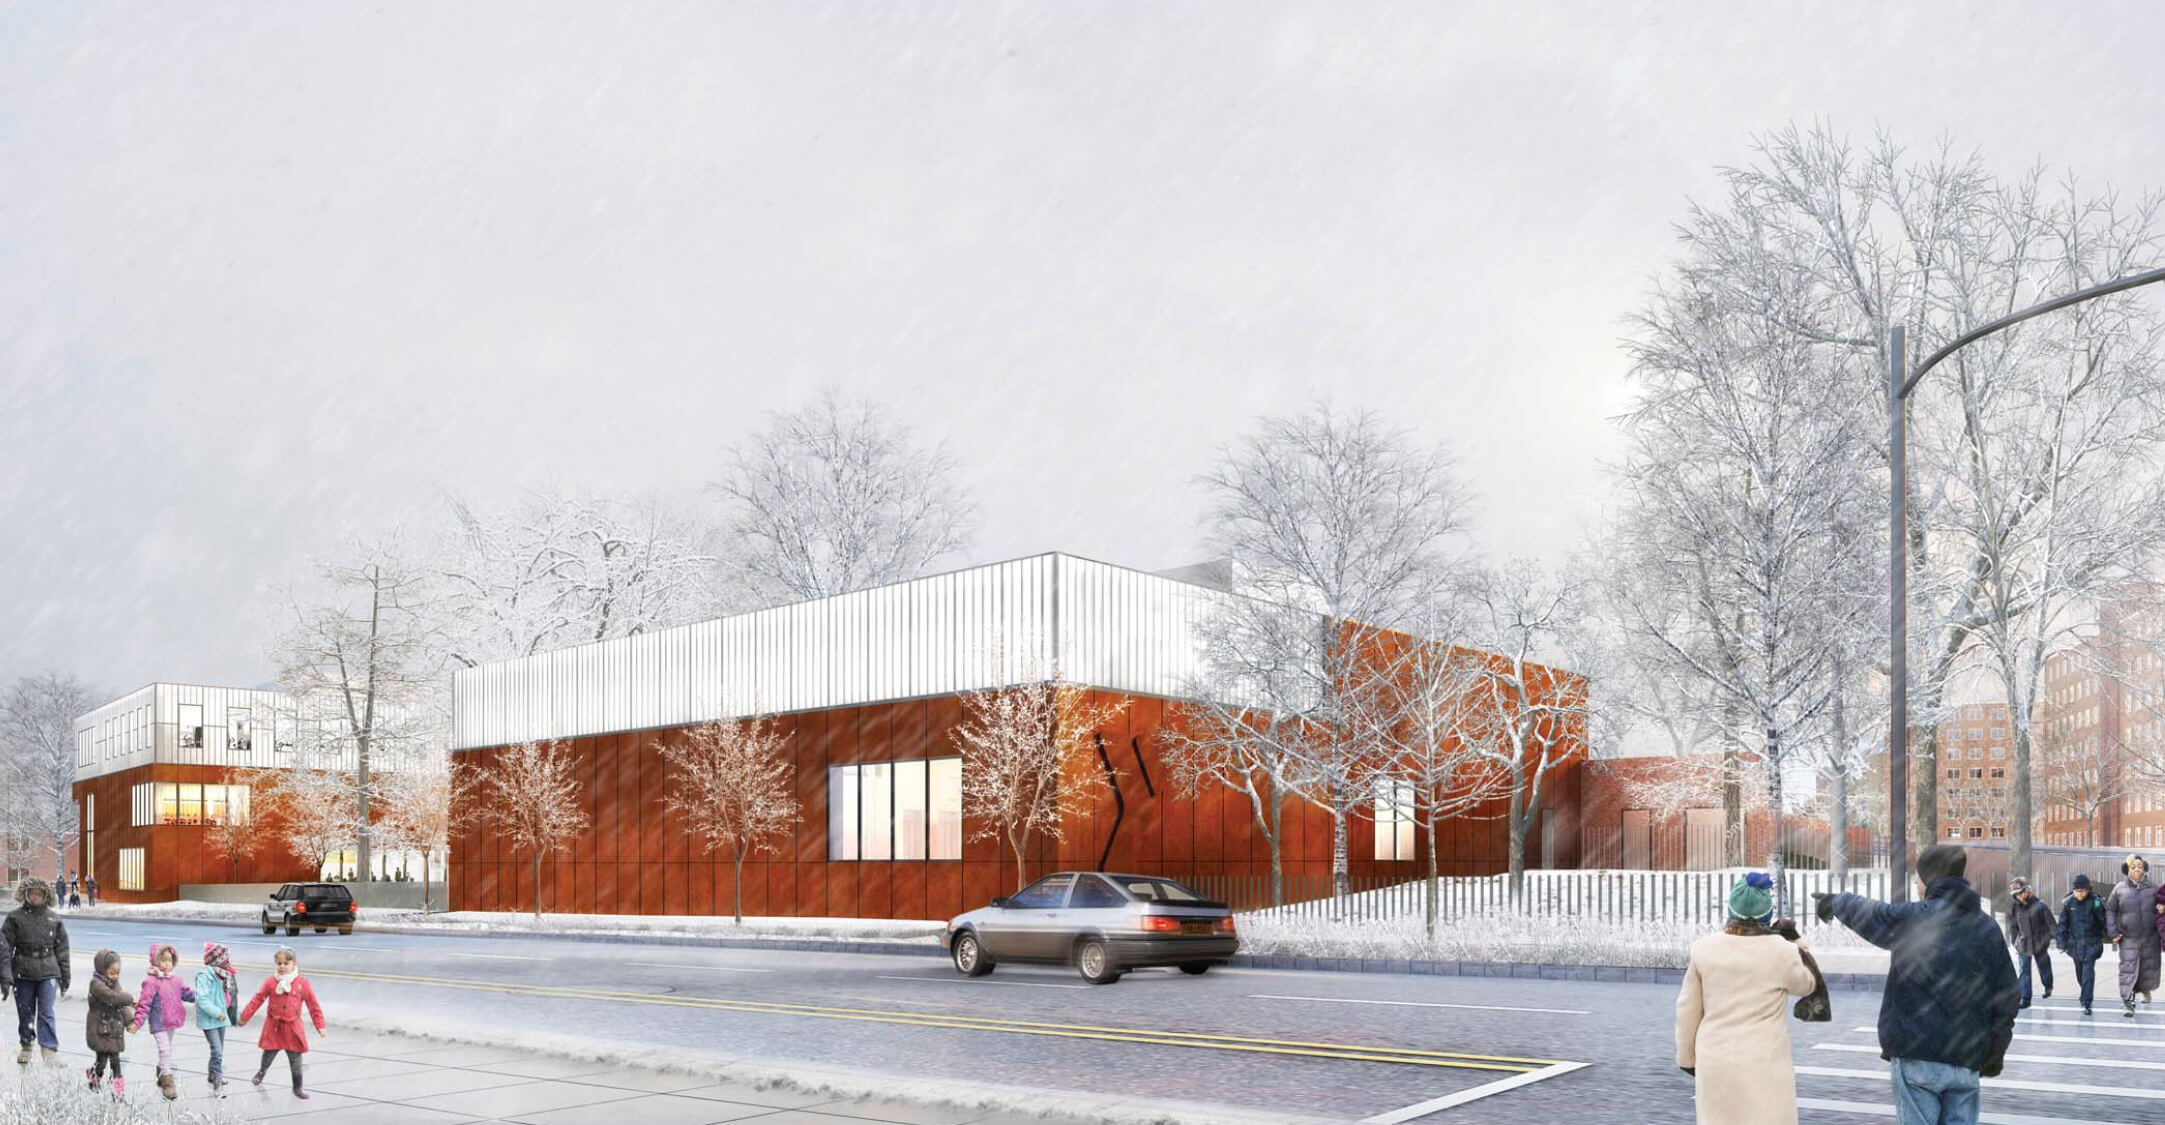 Renderings Revealed For YMCA At 1250 East 229th Street, Edenwald, Bronx